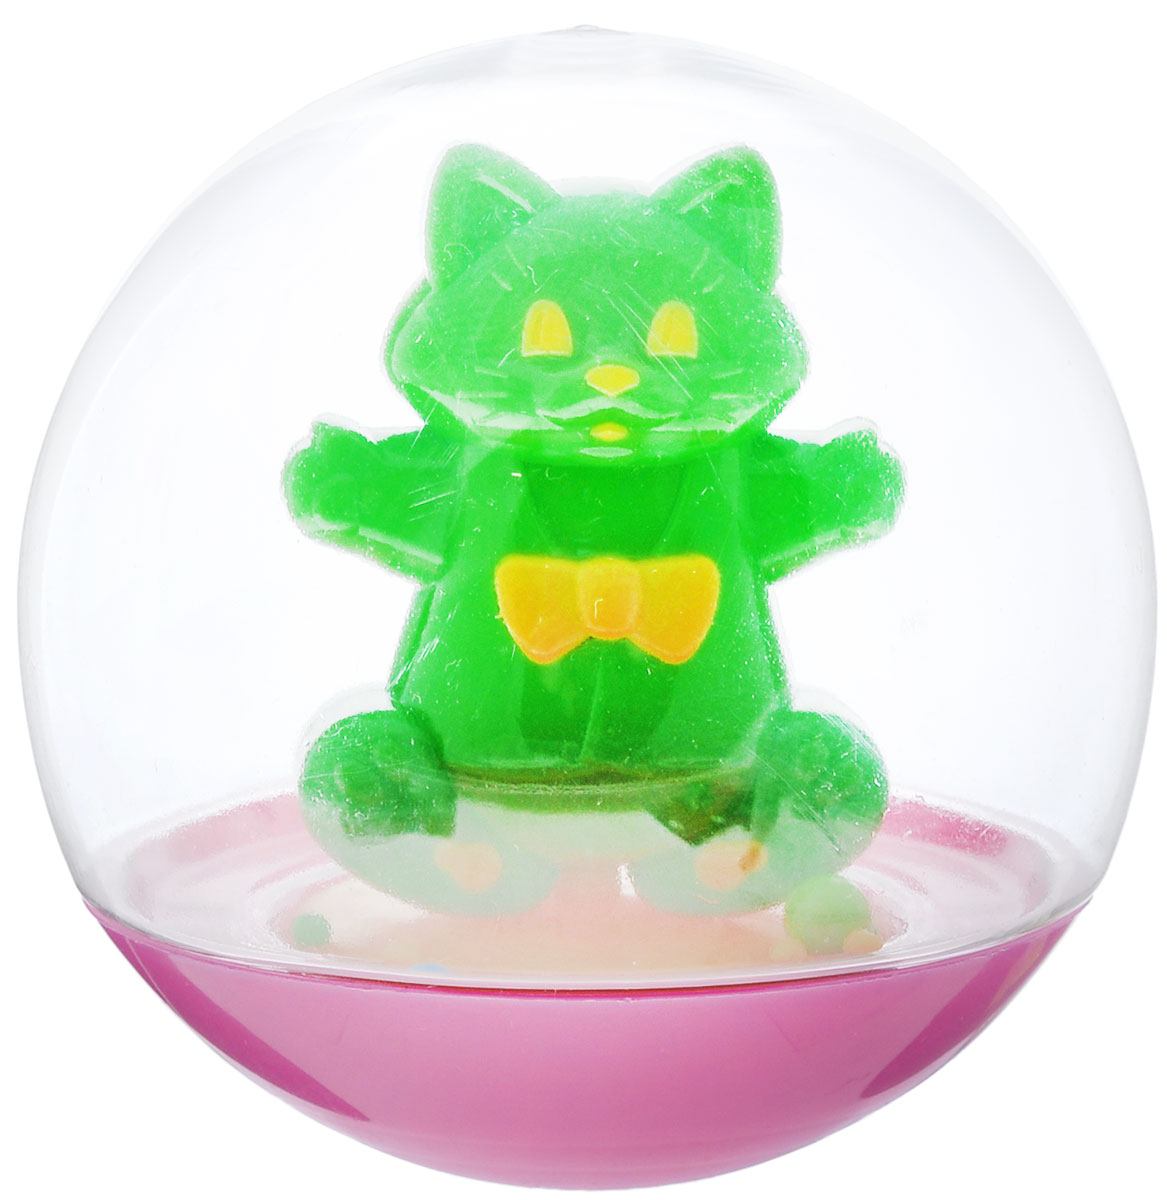 Stellar Погремушка-неваляшка Кот цвет зеленый погремушки стеллар галактика